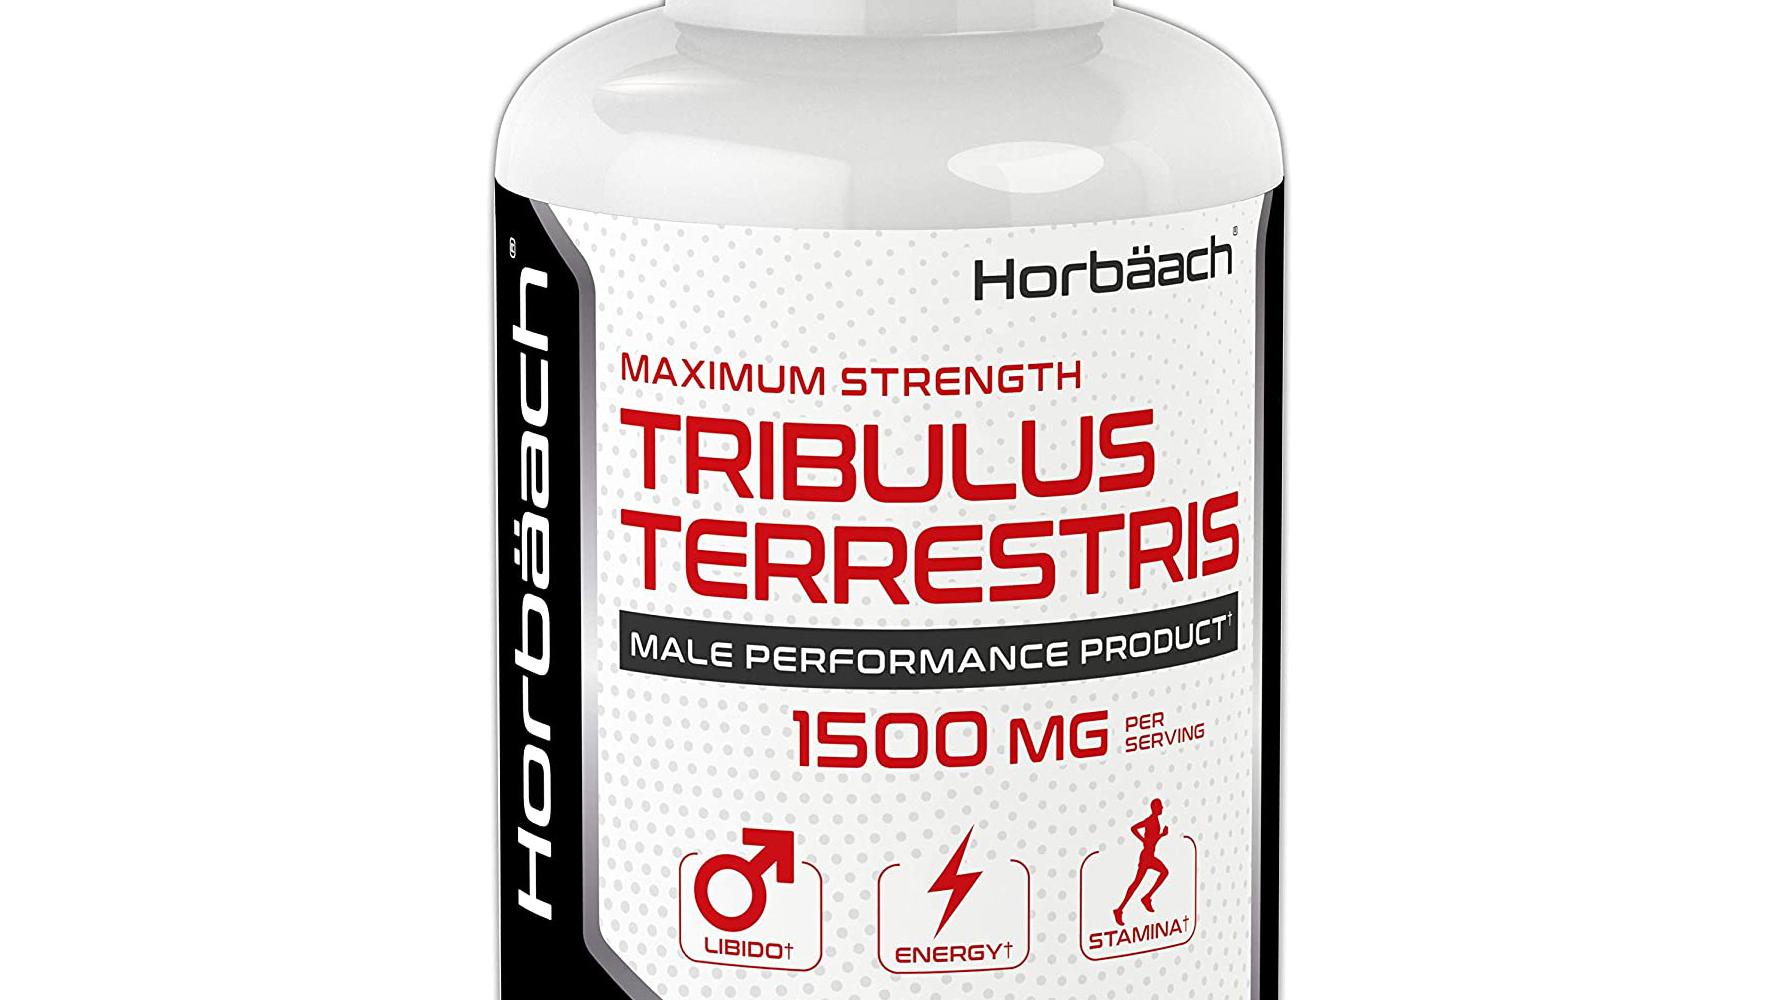 tribulus terrestris non-steroid supplement